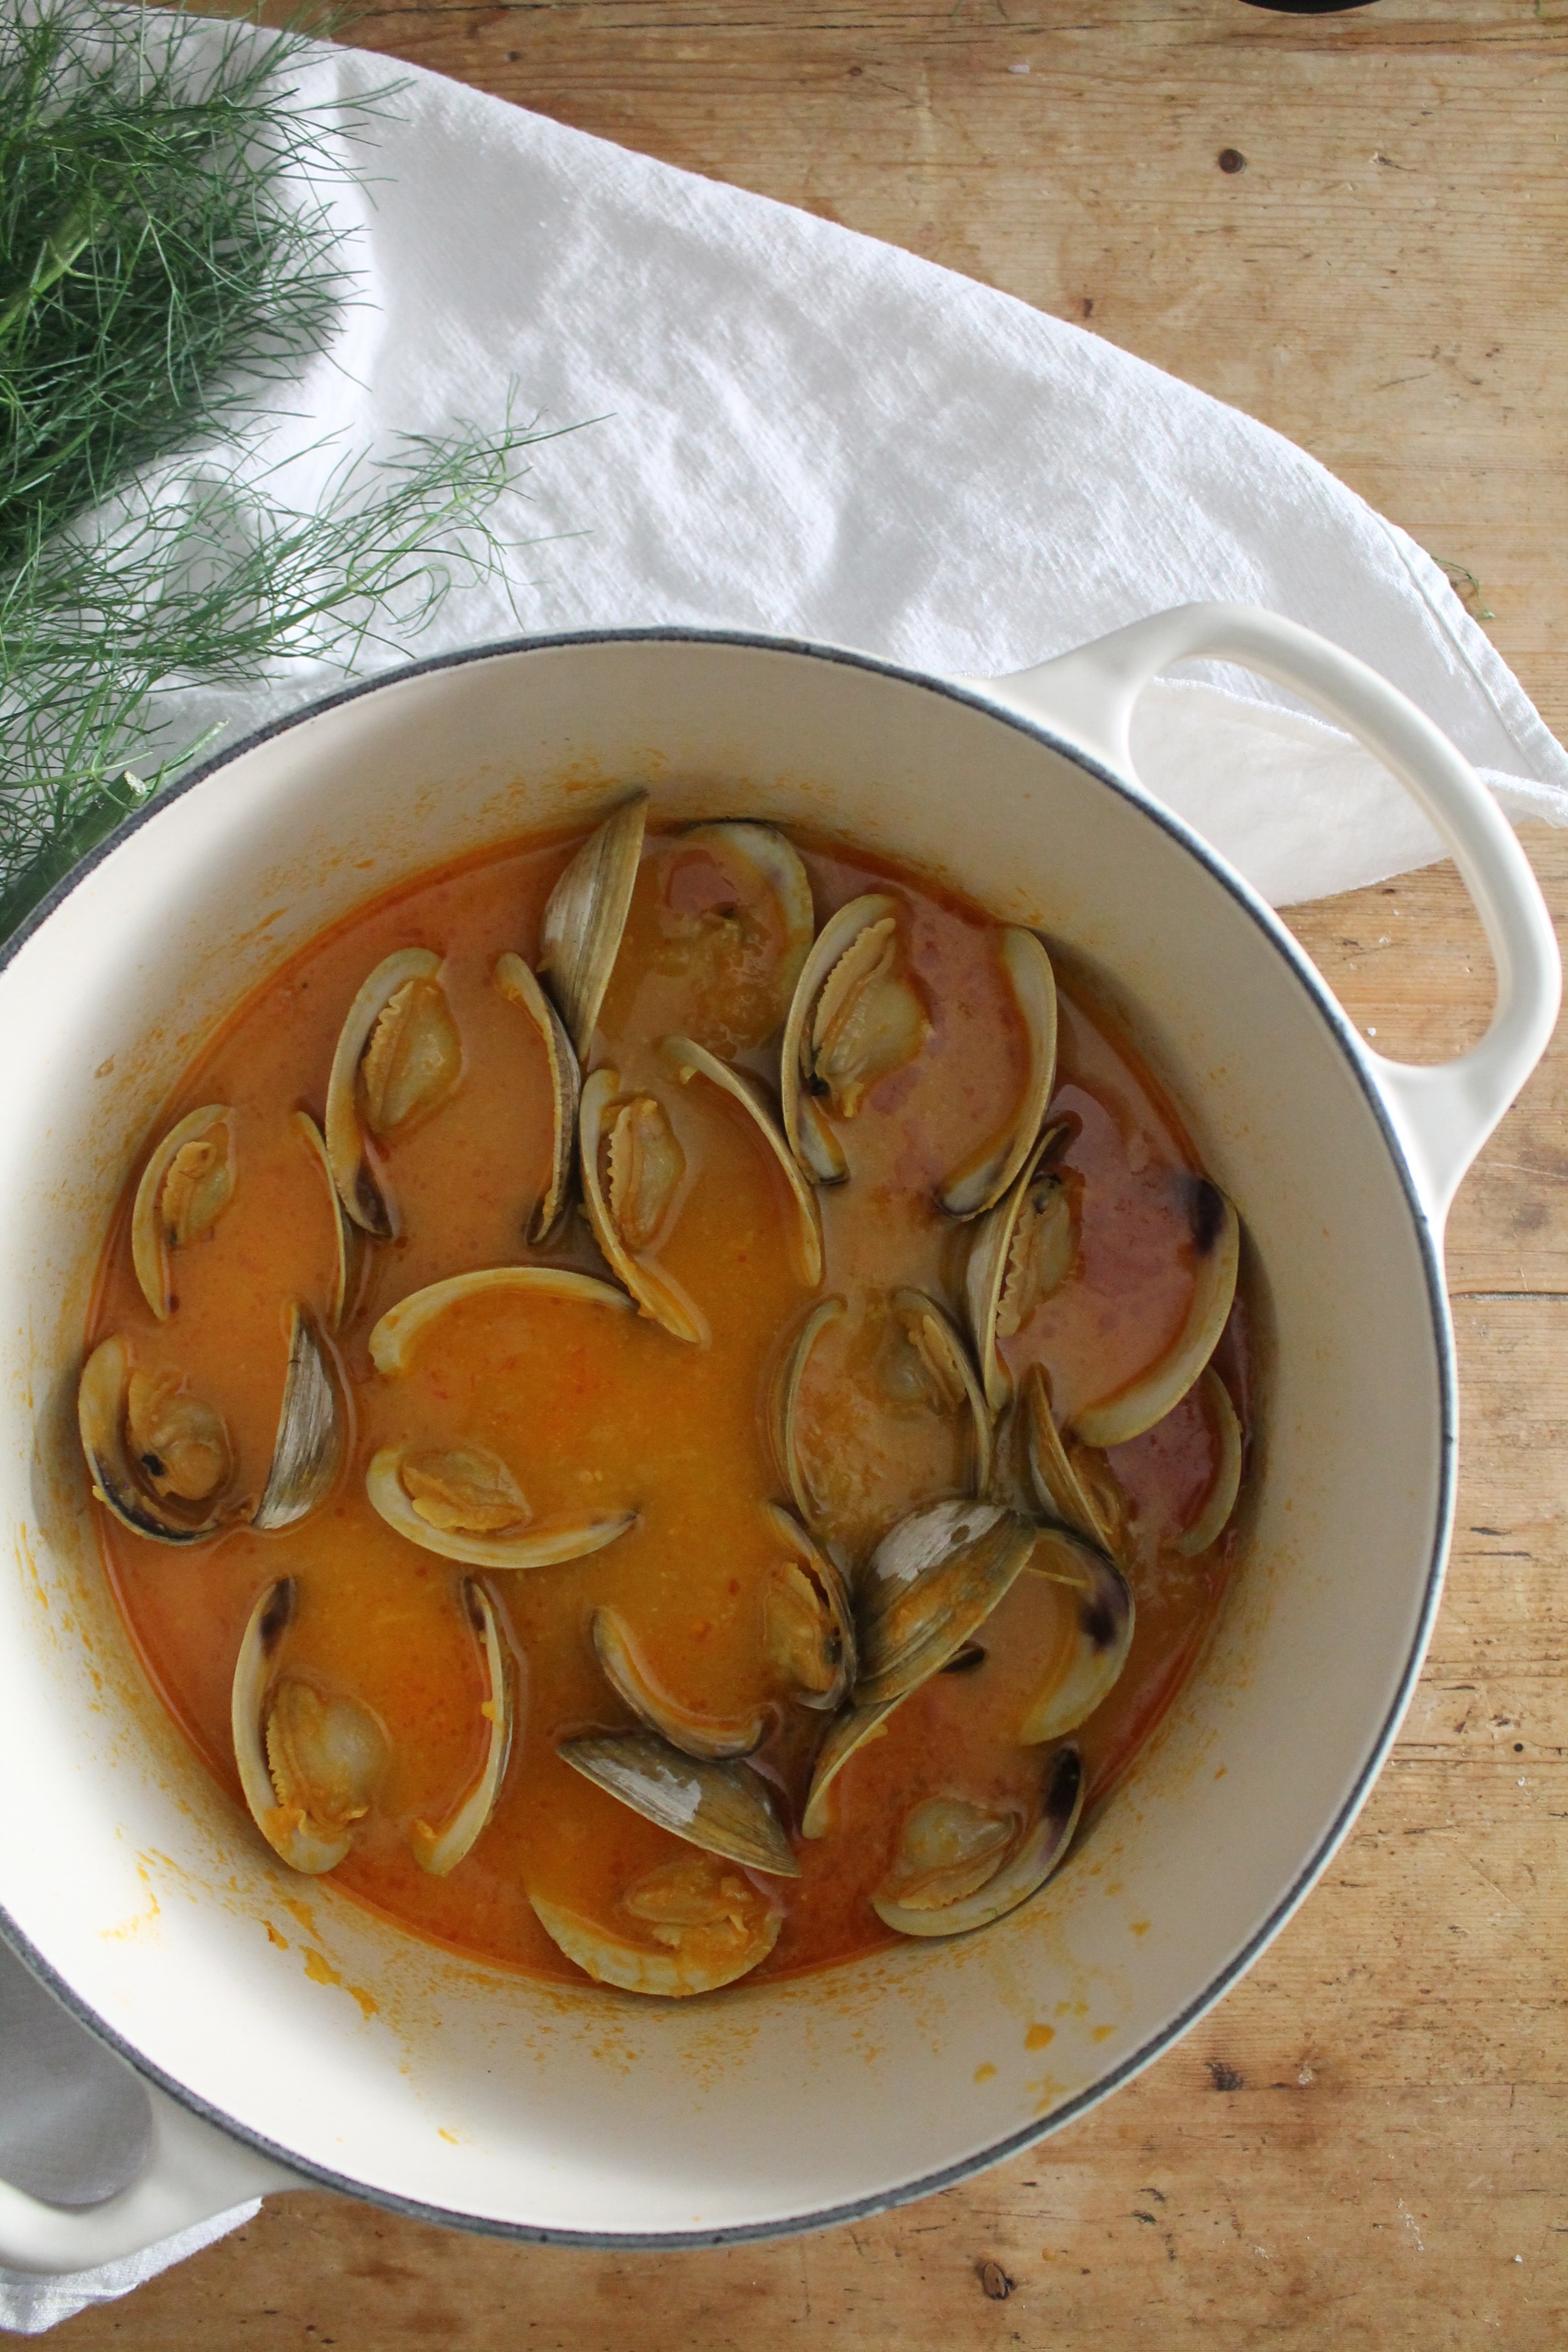 Cherrystones with Saffron + Fregola | www.hungryinlove.com